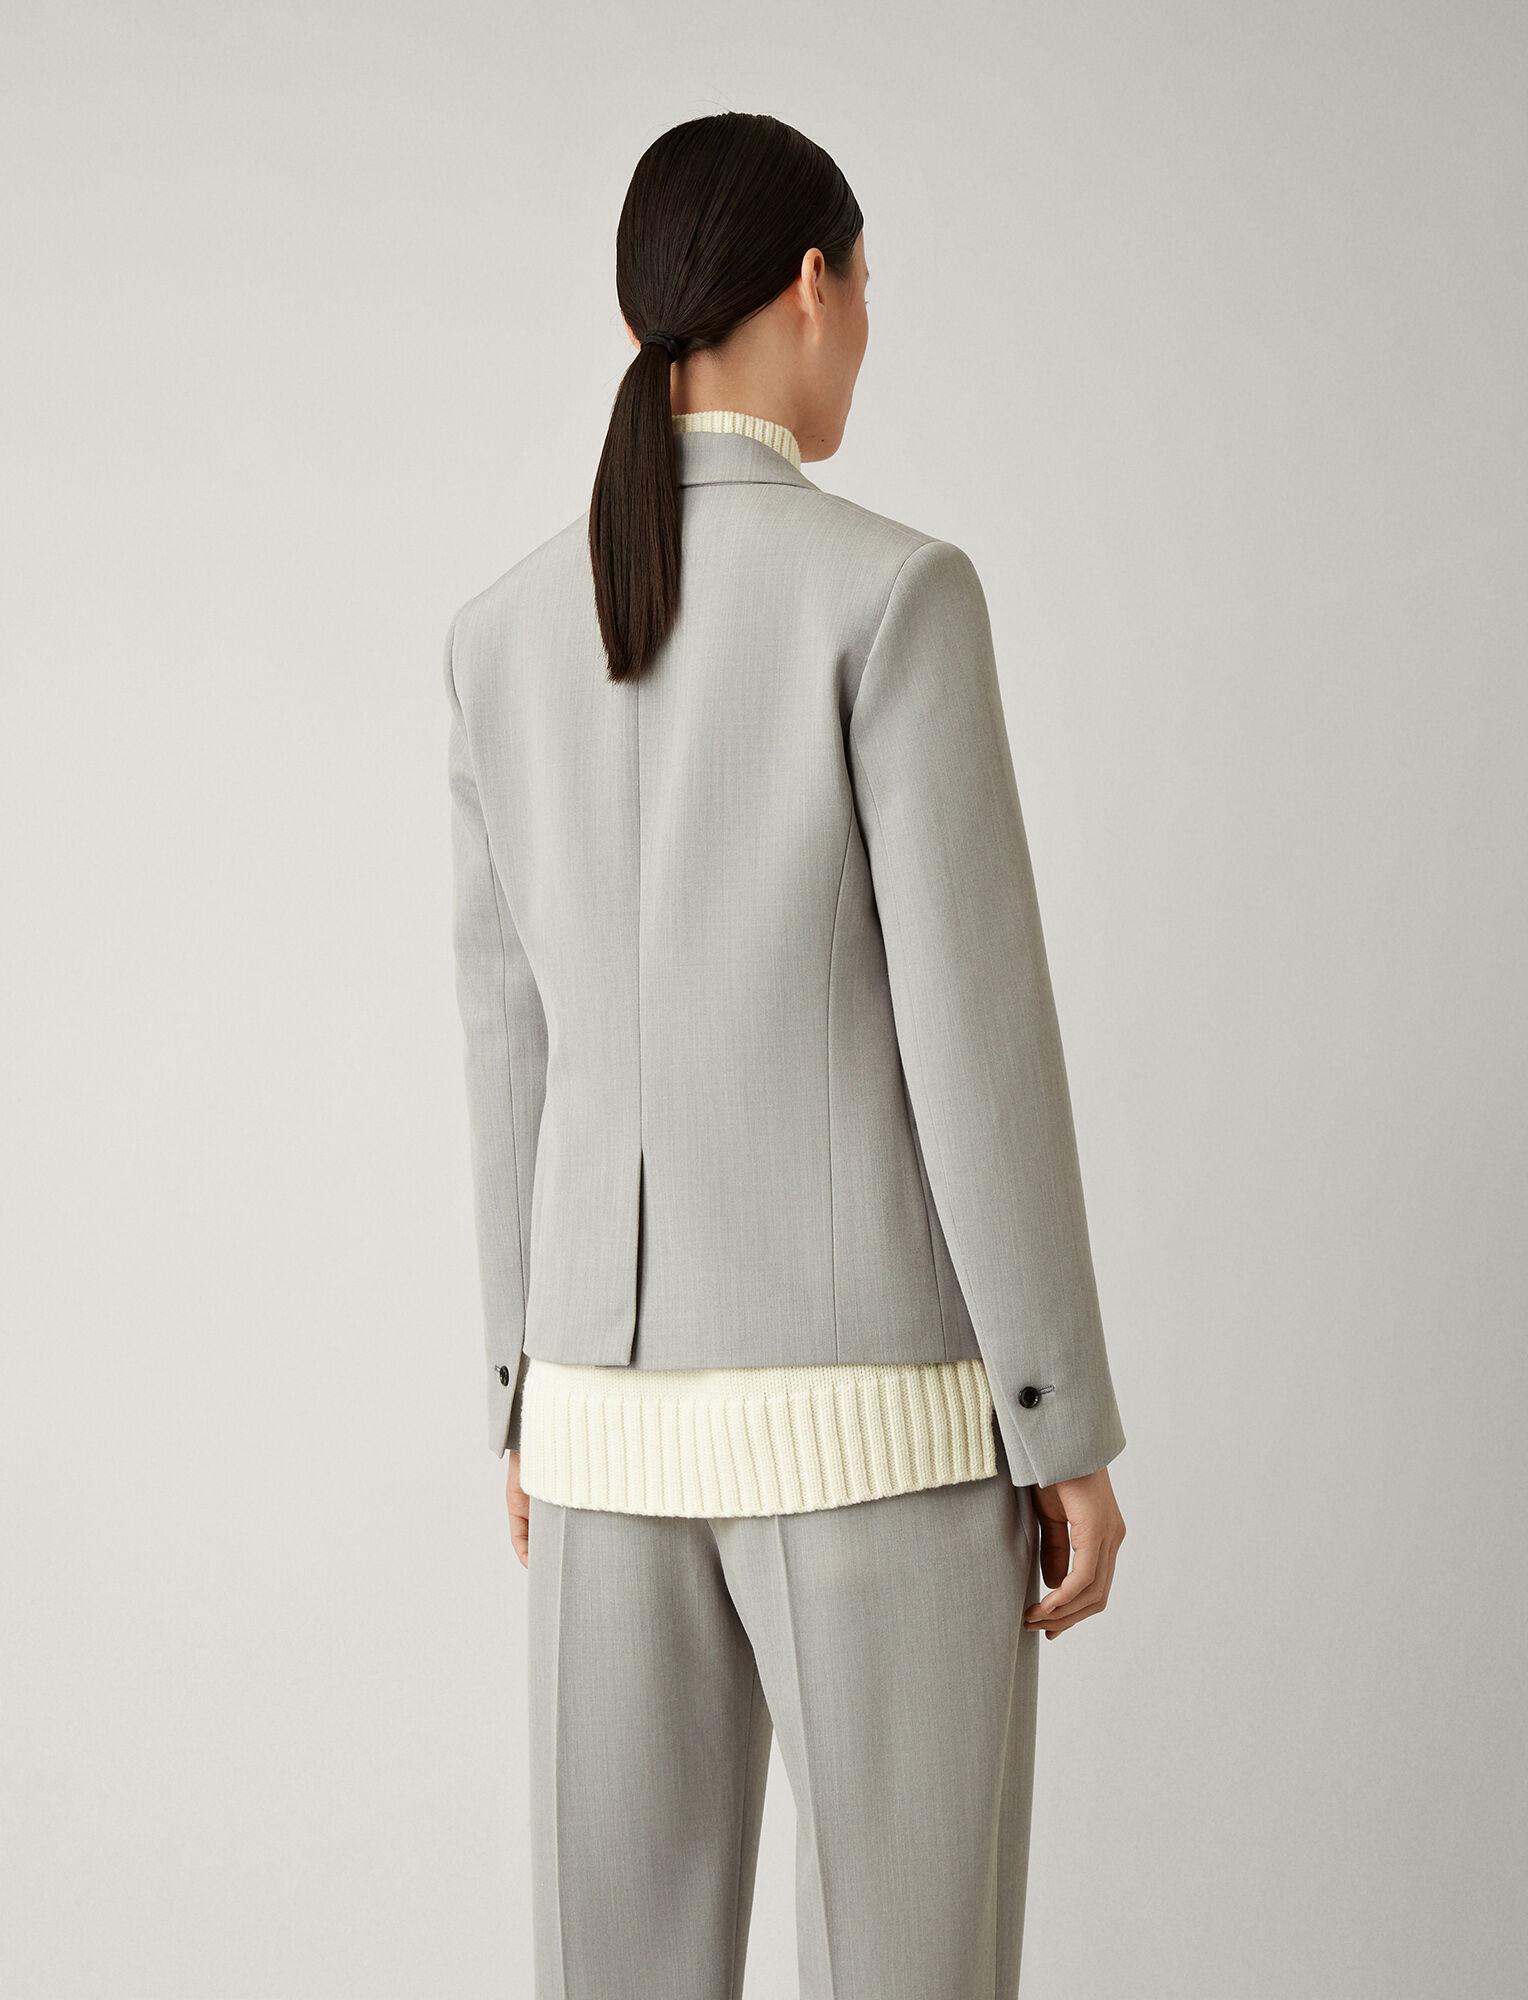 Joseph, Imma Comfort Wool Jacket, in GREY